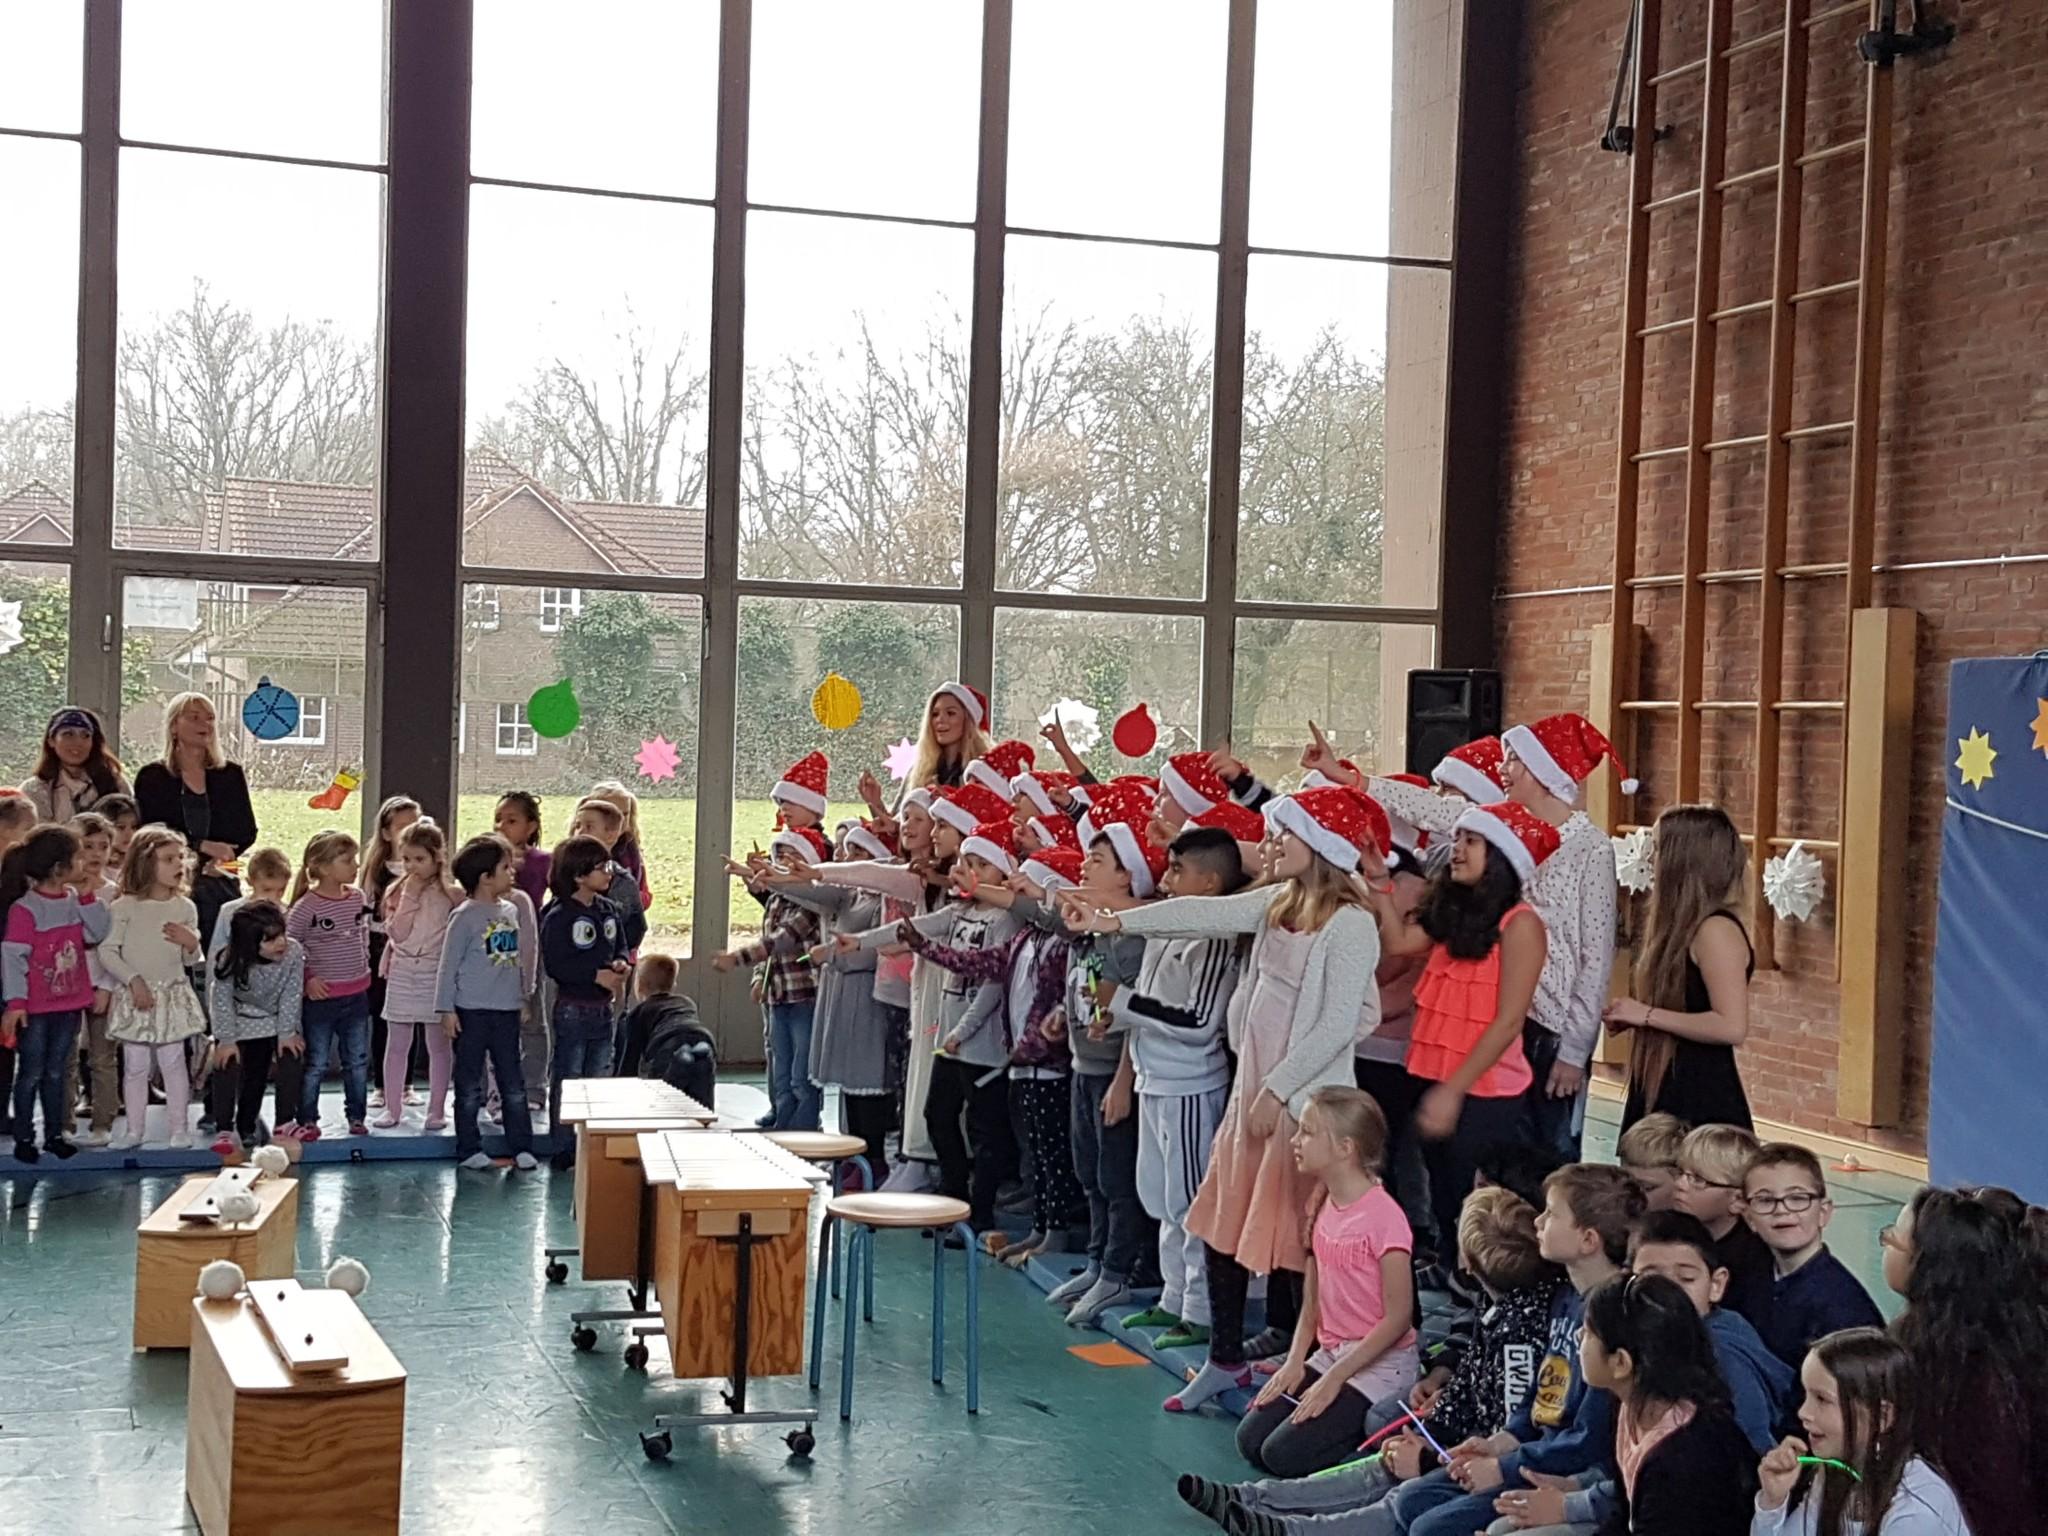 Weihnachtssingen | Grundschule Potsdamer Straße